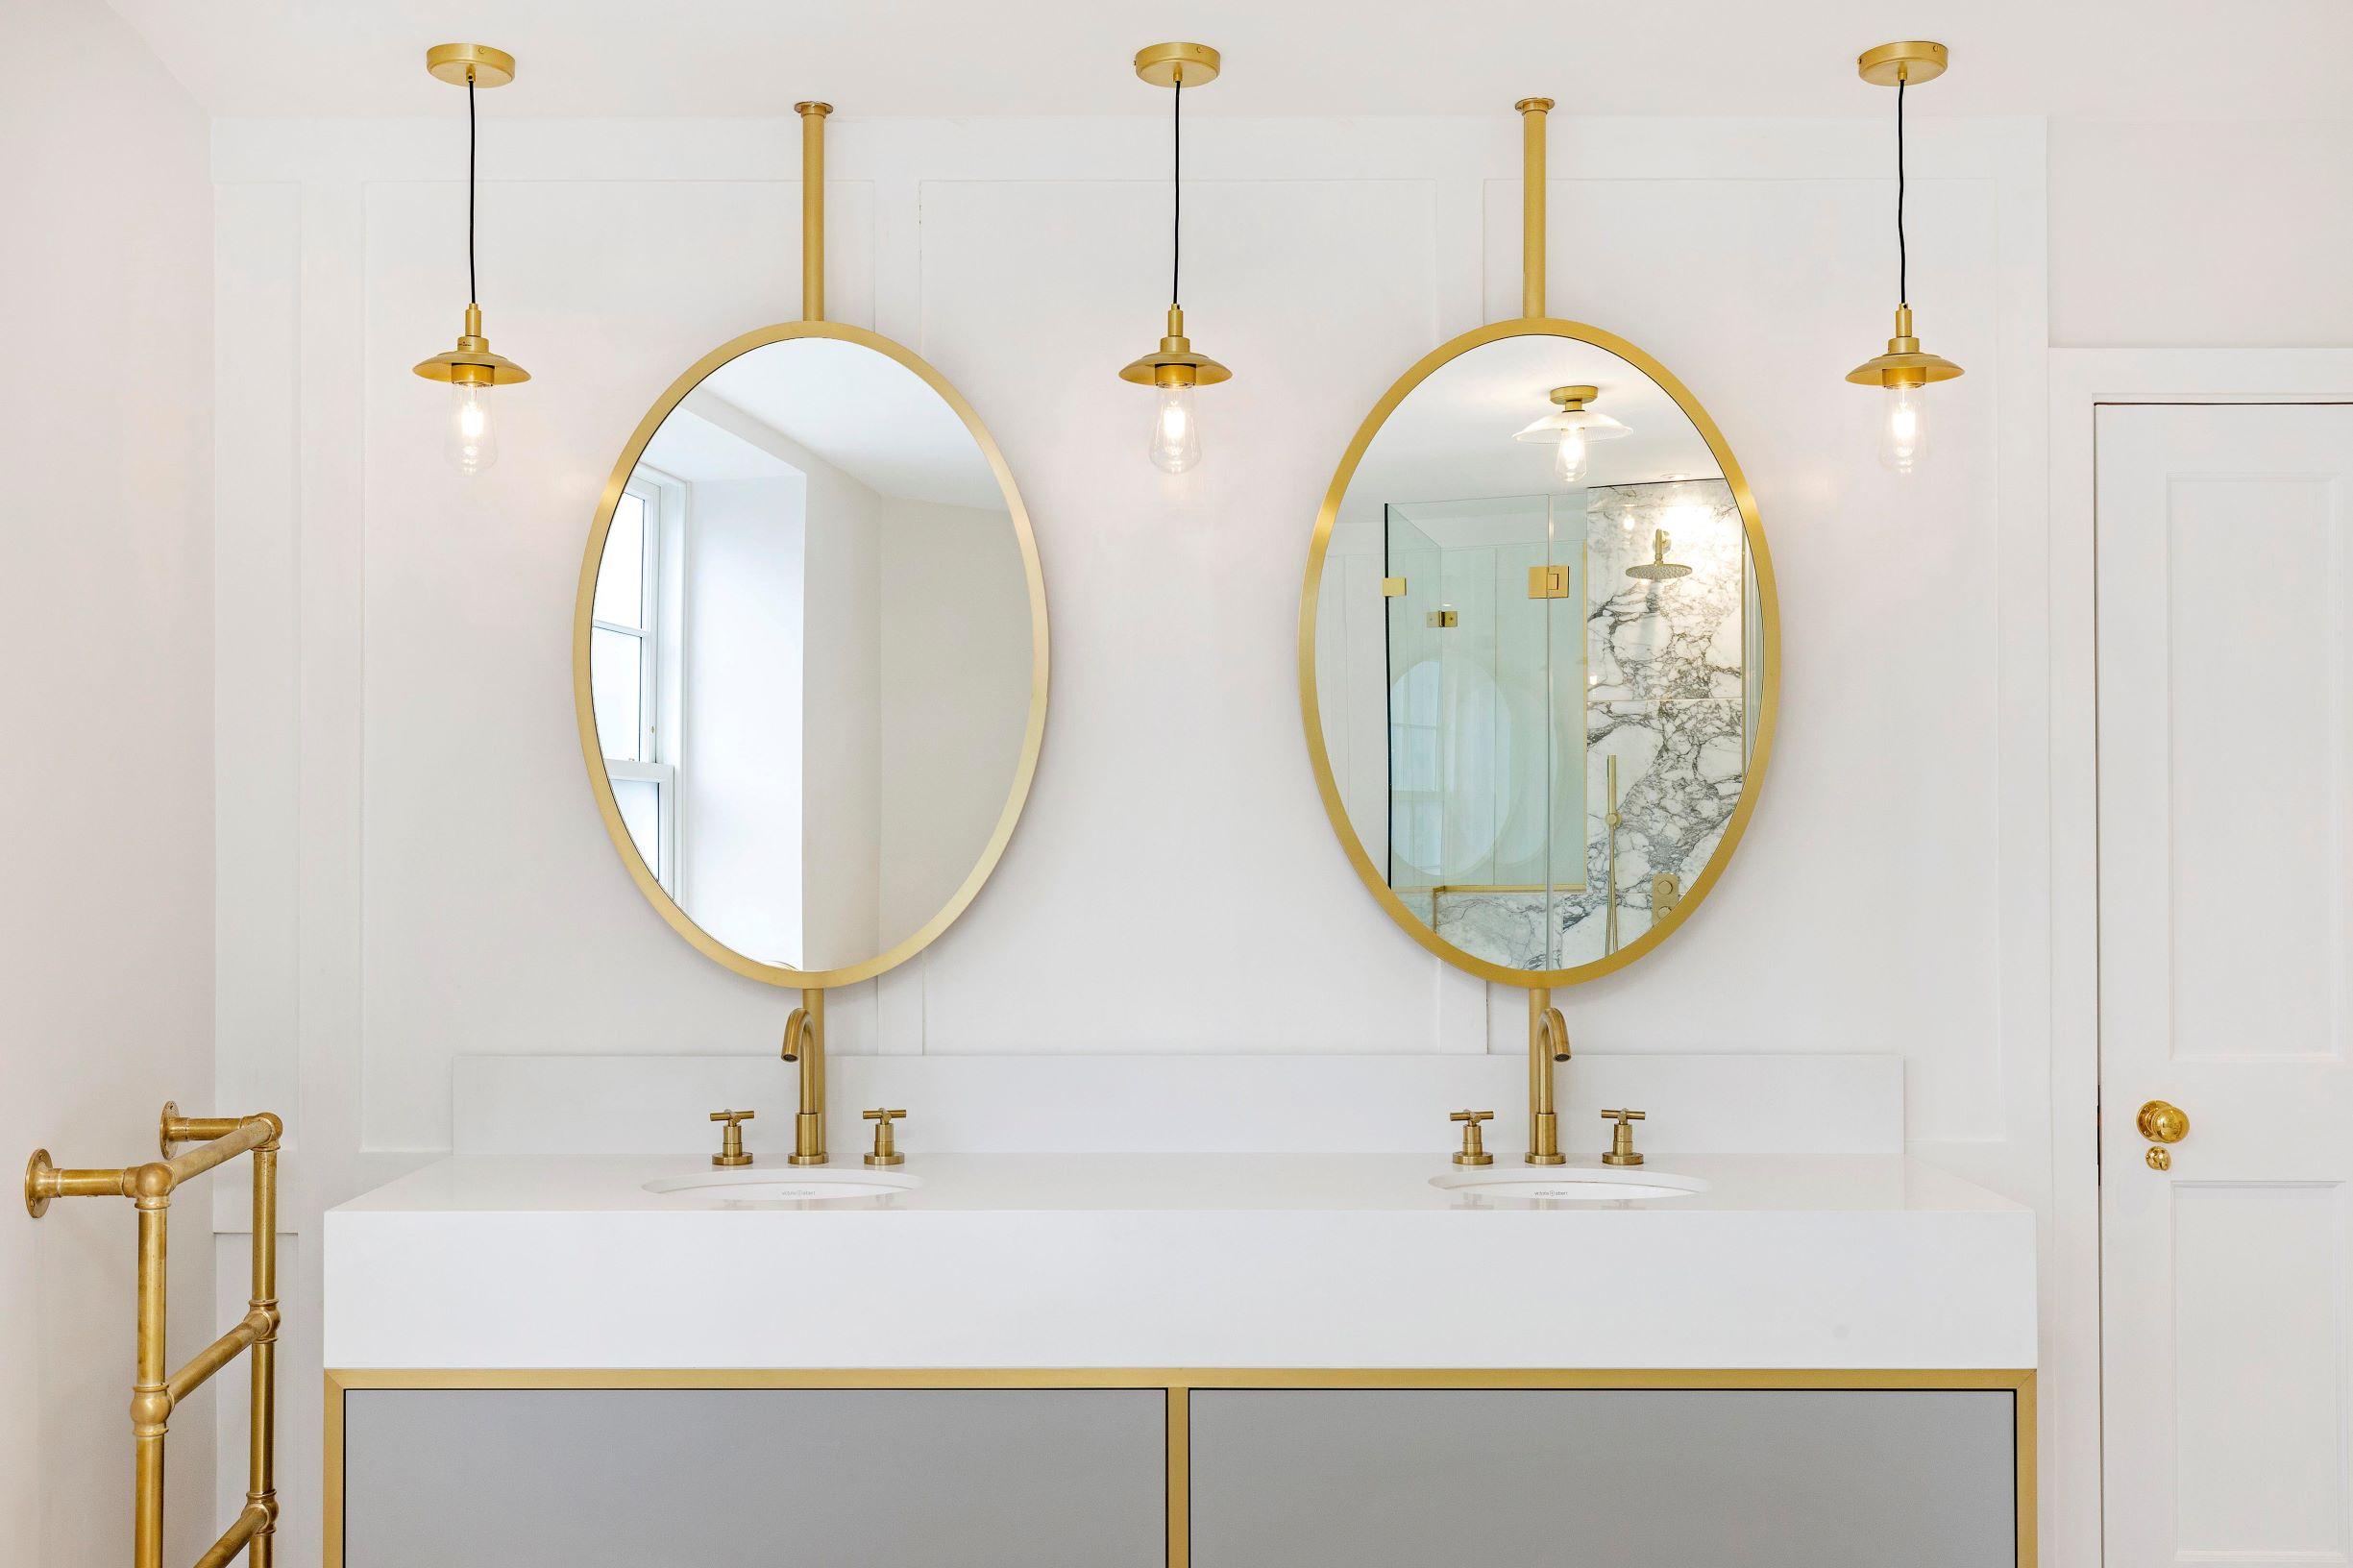 Ann Gibbons Interior Design, Richmond Green, London